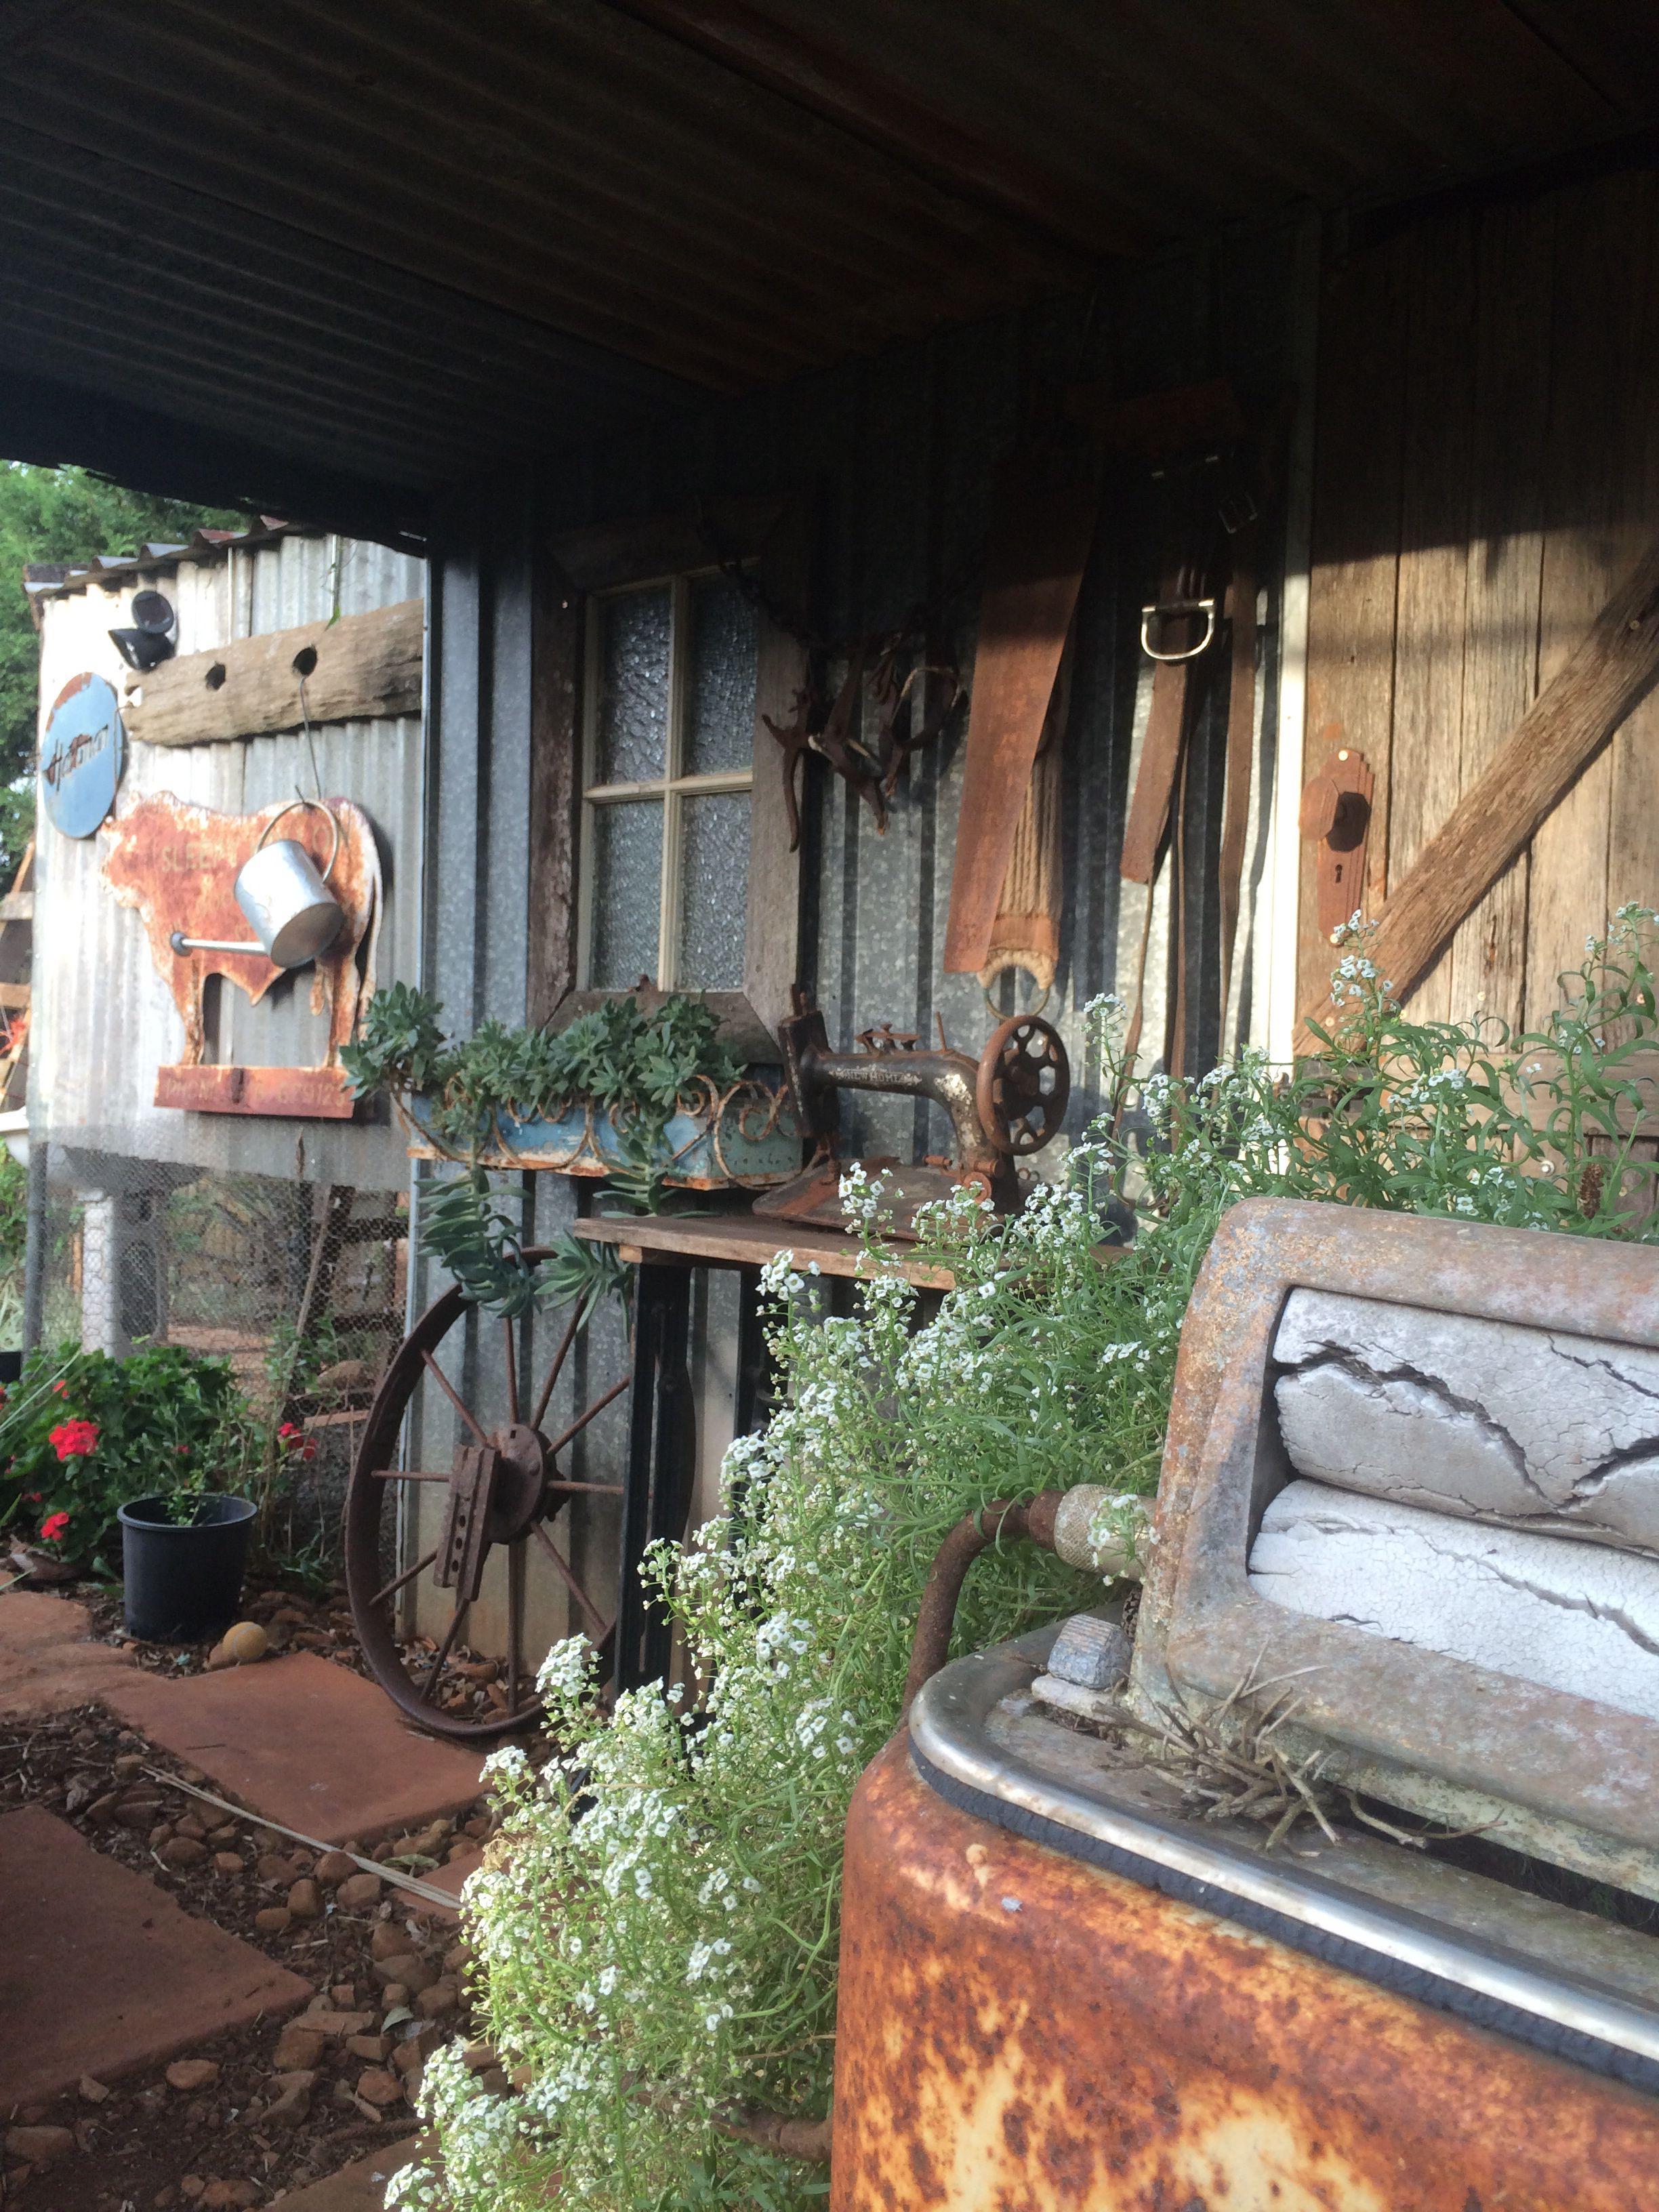 Wagon wheel. Rusty washing machine planter. Toowoomba